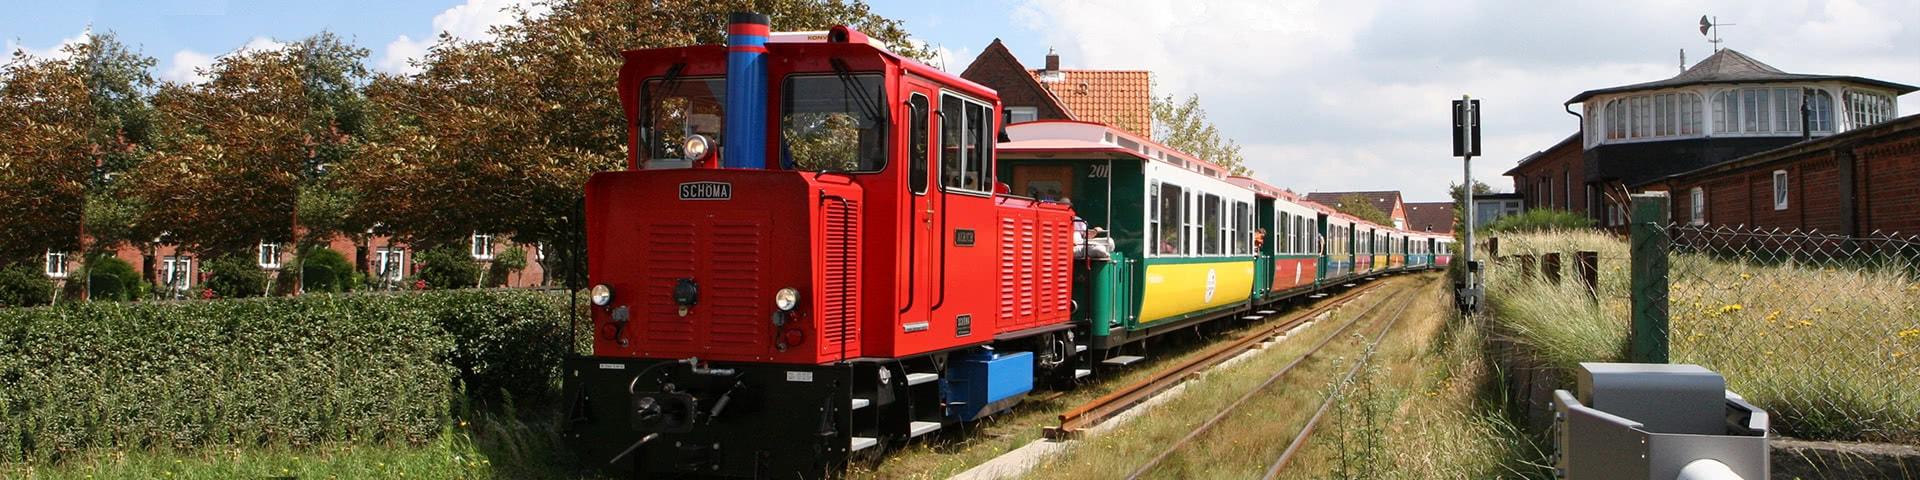 Bunte Inselbahn auf Borkum